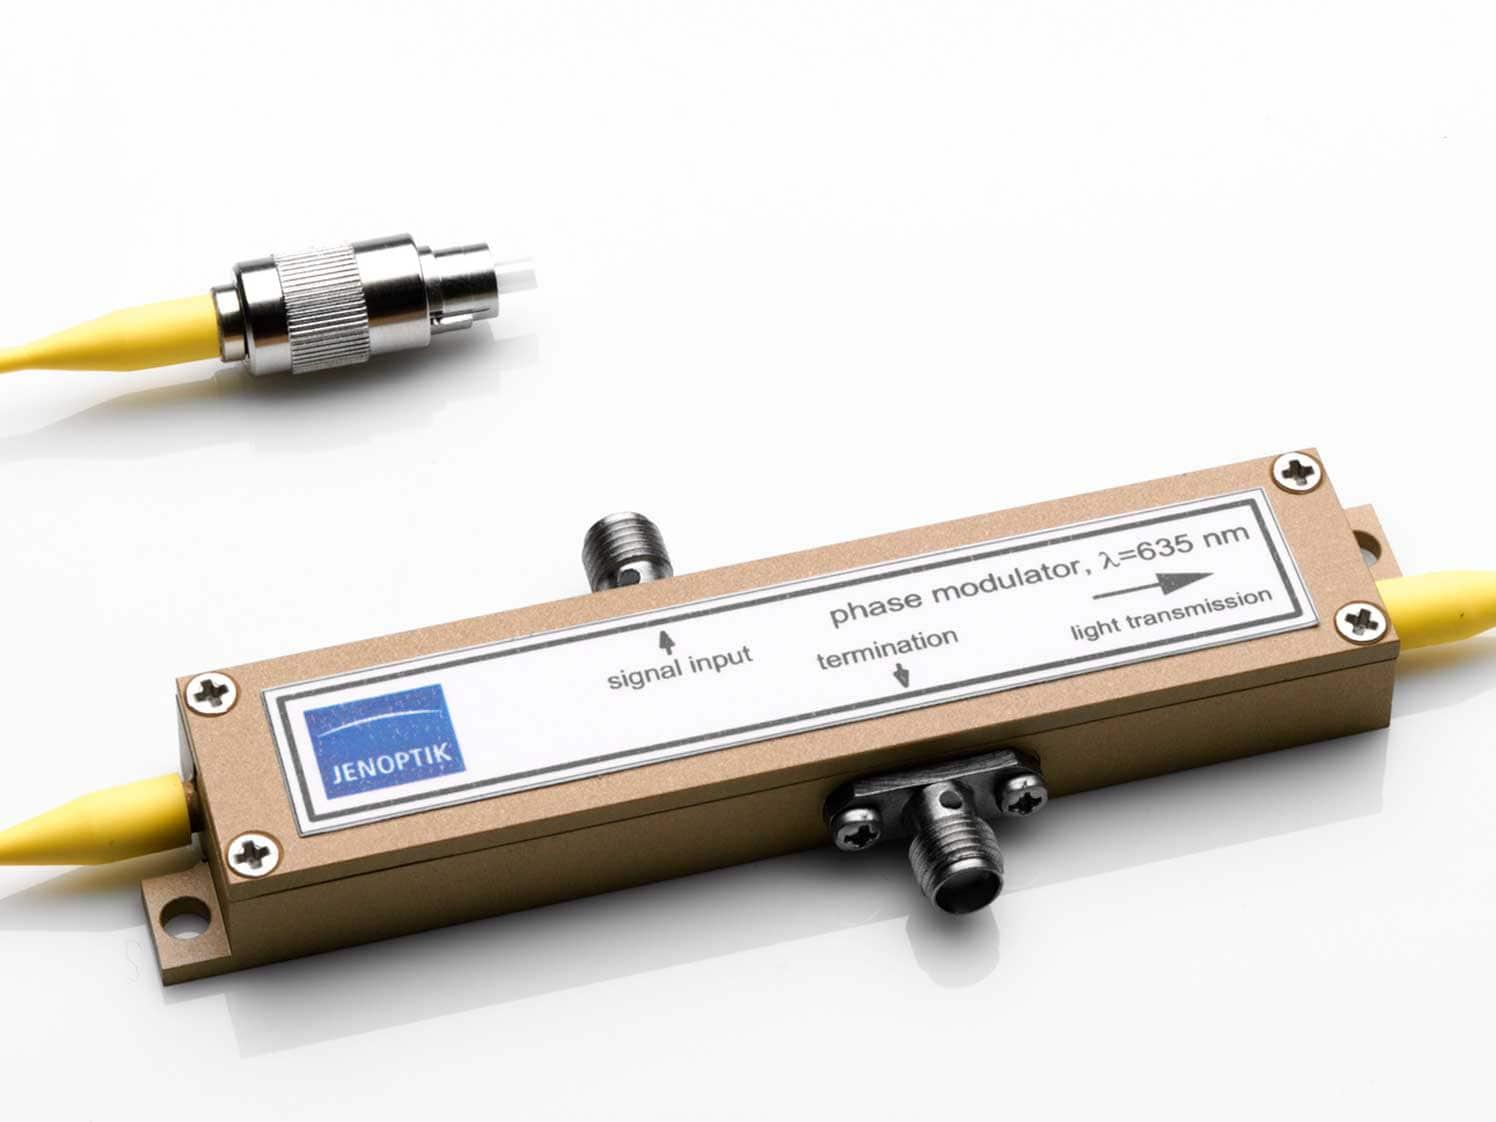 Phase modulators from Jenoptik